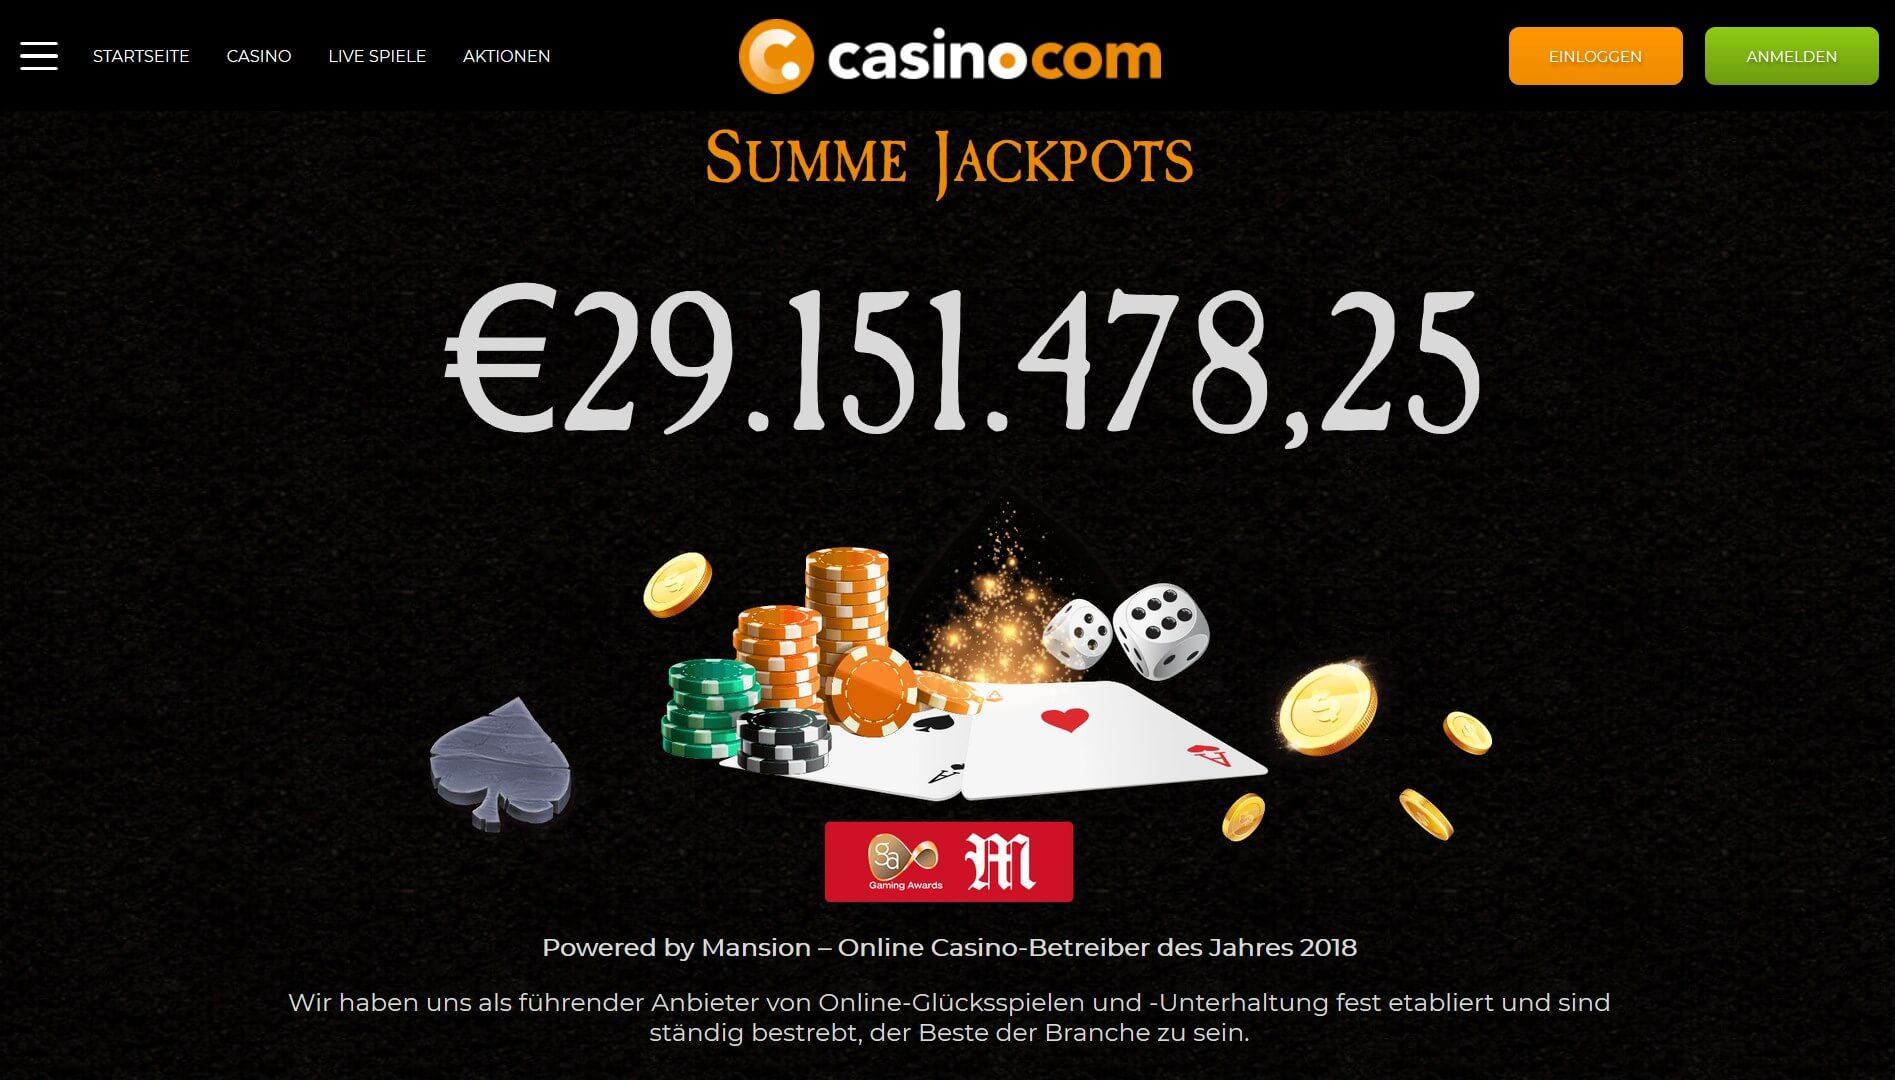 Hit the jackpot at Casino.com